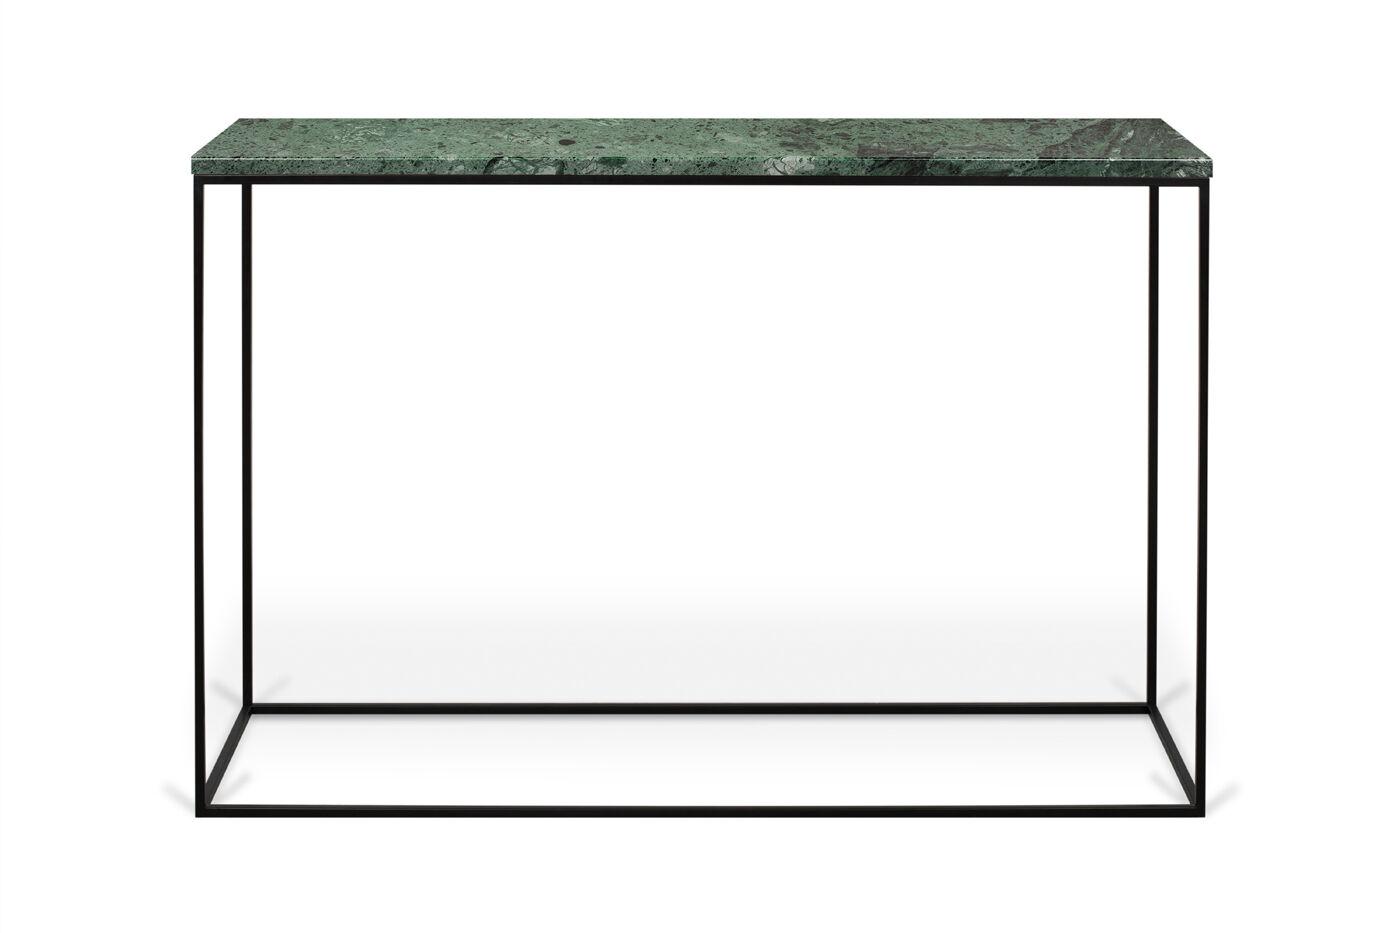 Temahome - Gleam Konsollbord - Grønn marmor